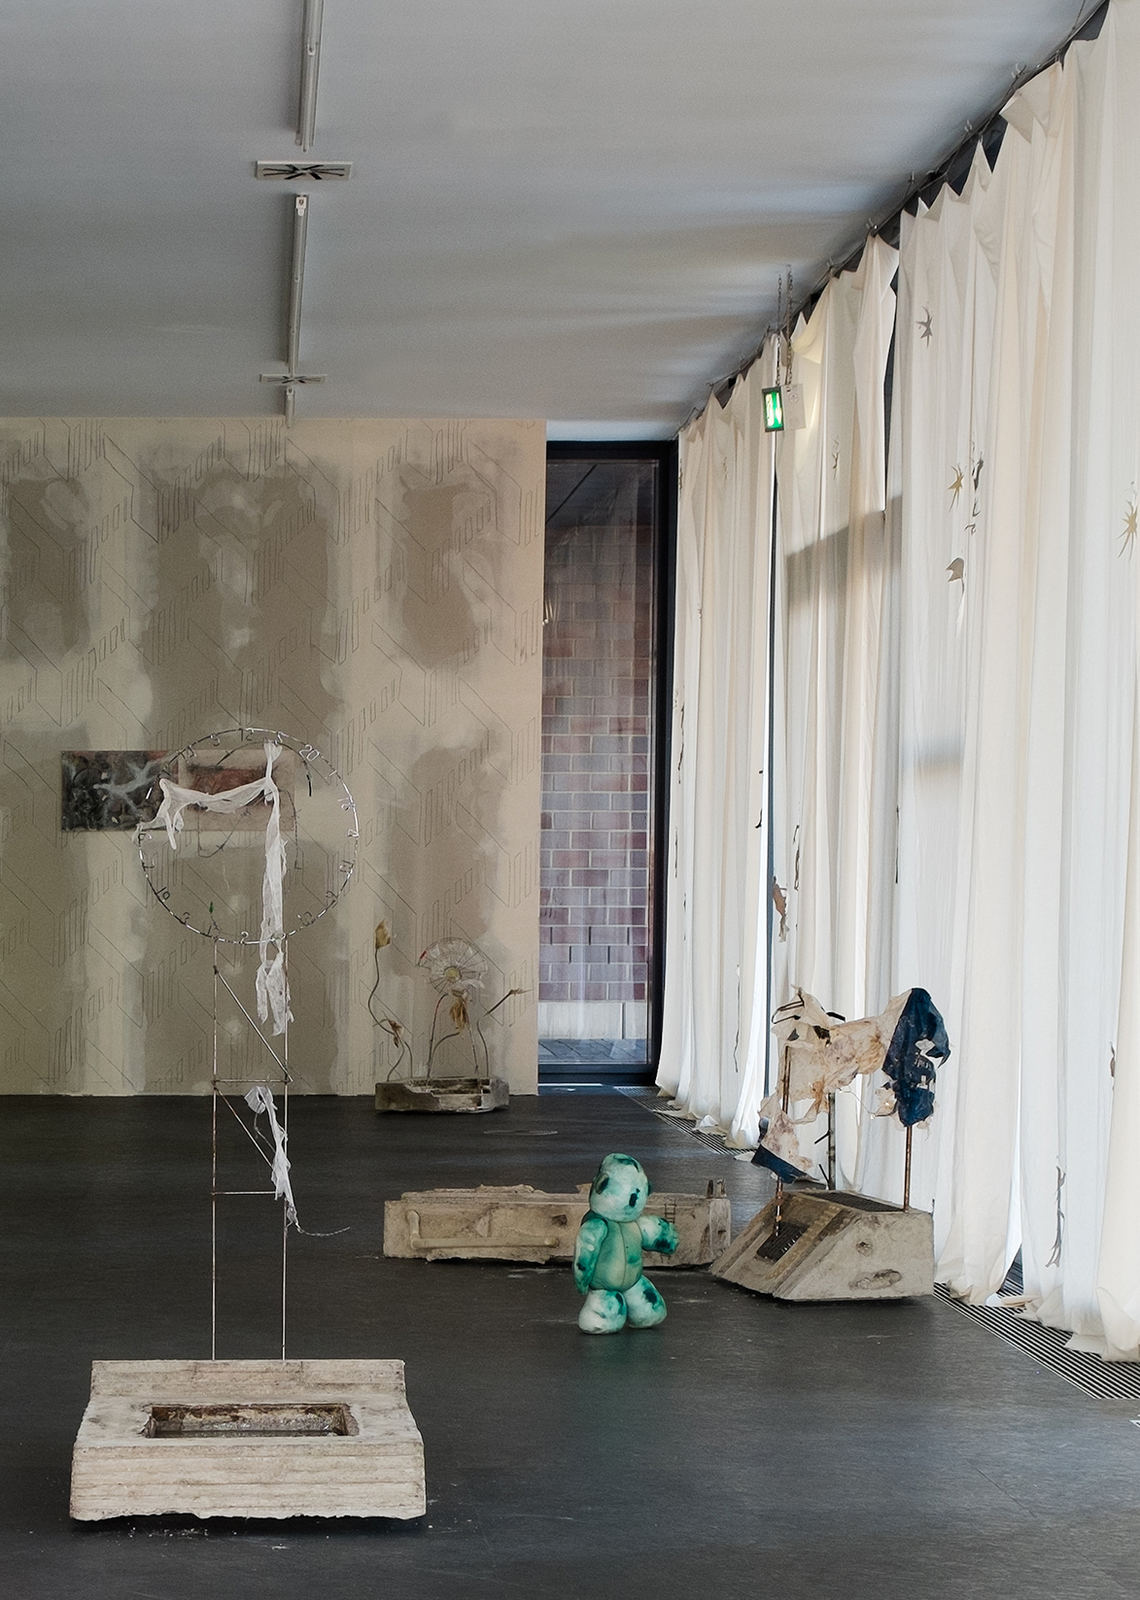 17_Installation view_ICHTS_2016_Dortmunder Kunstverein_Foto Niklas Taleb